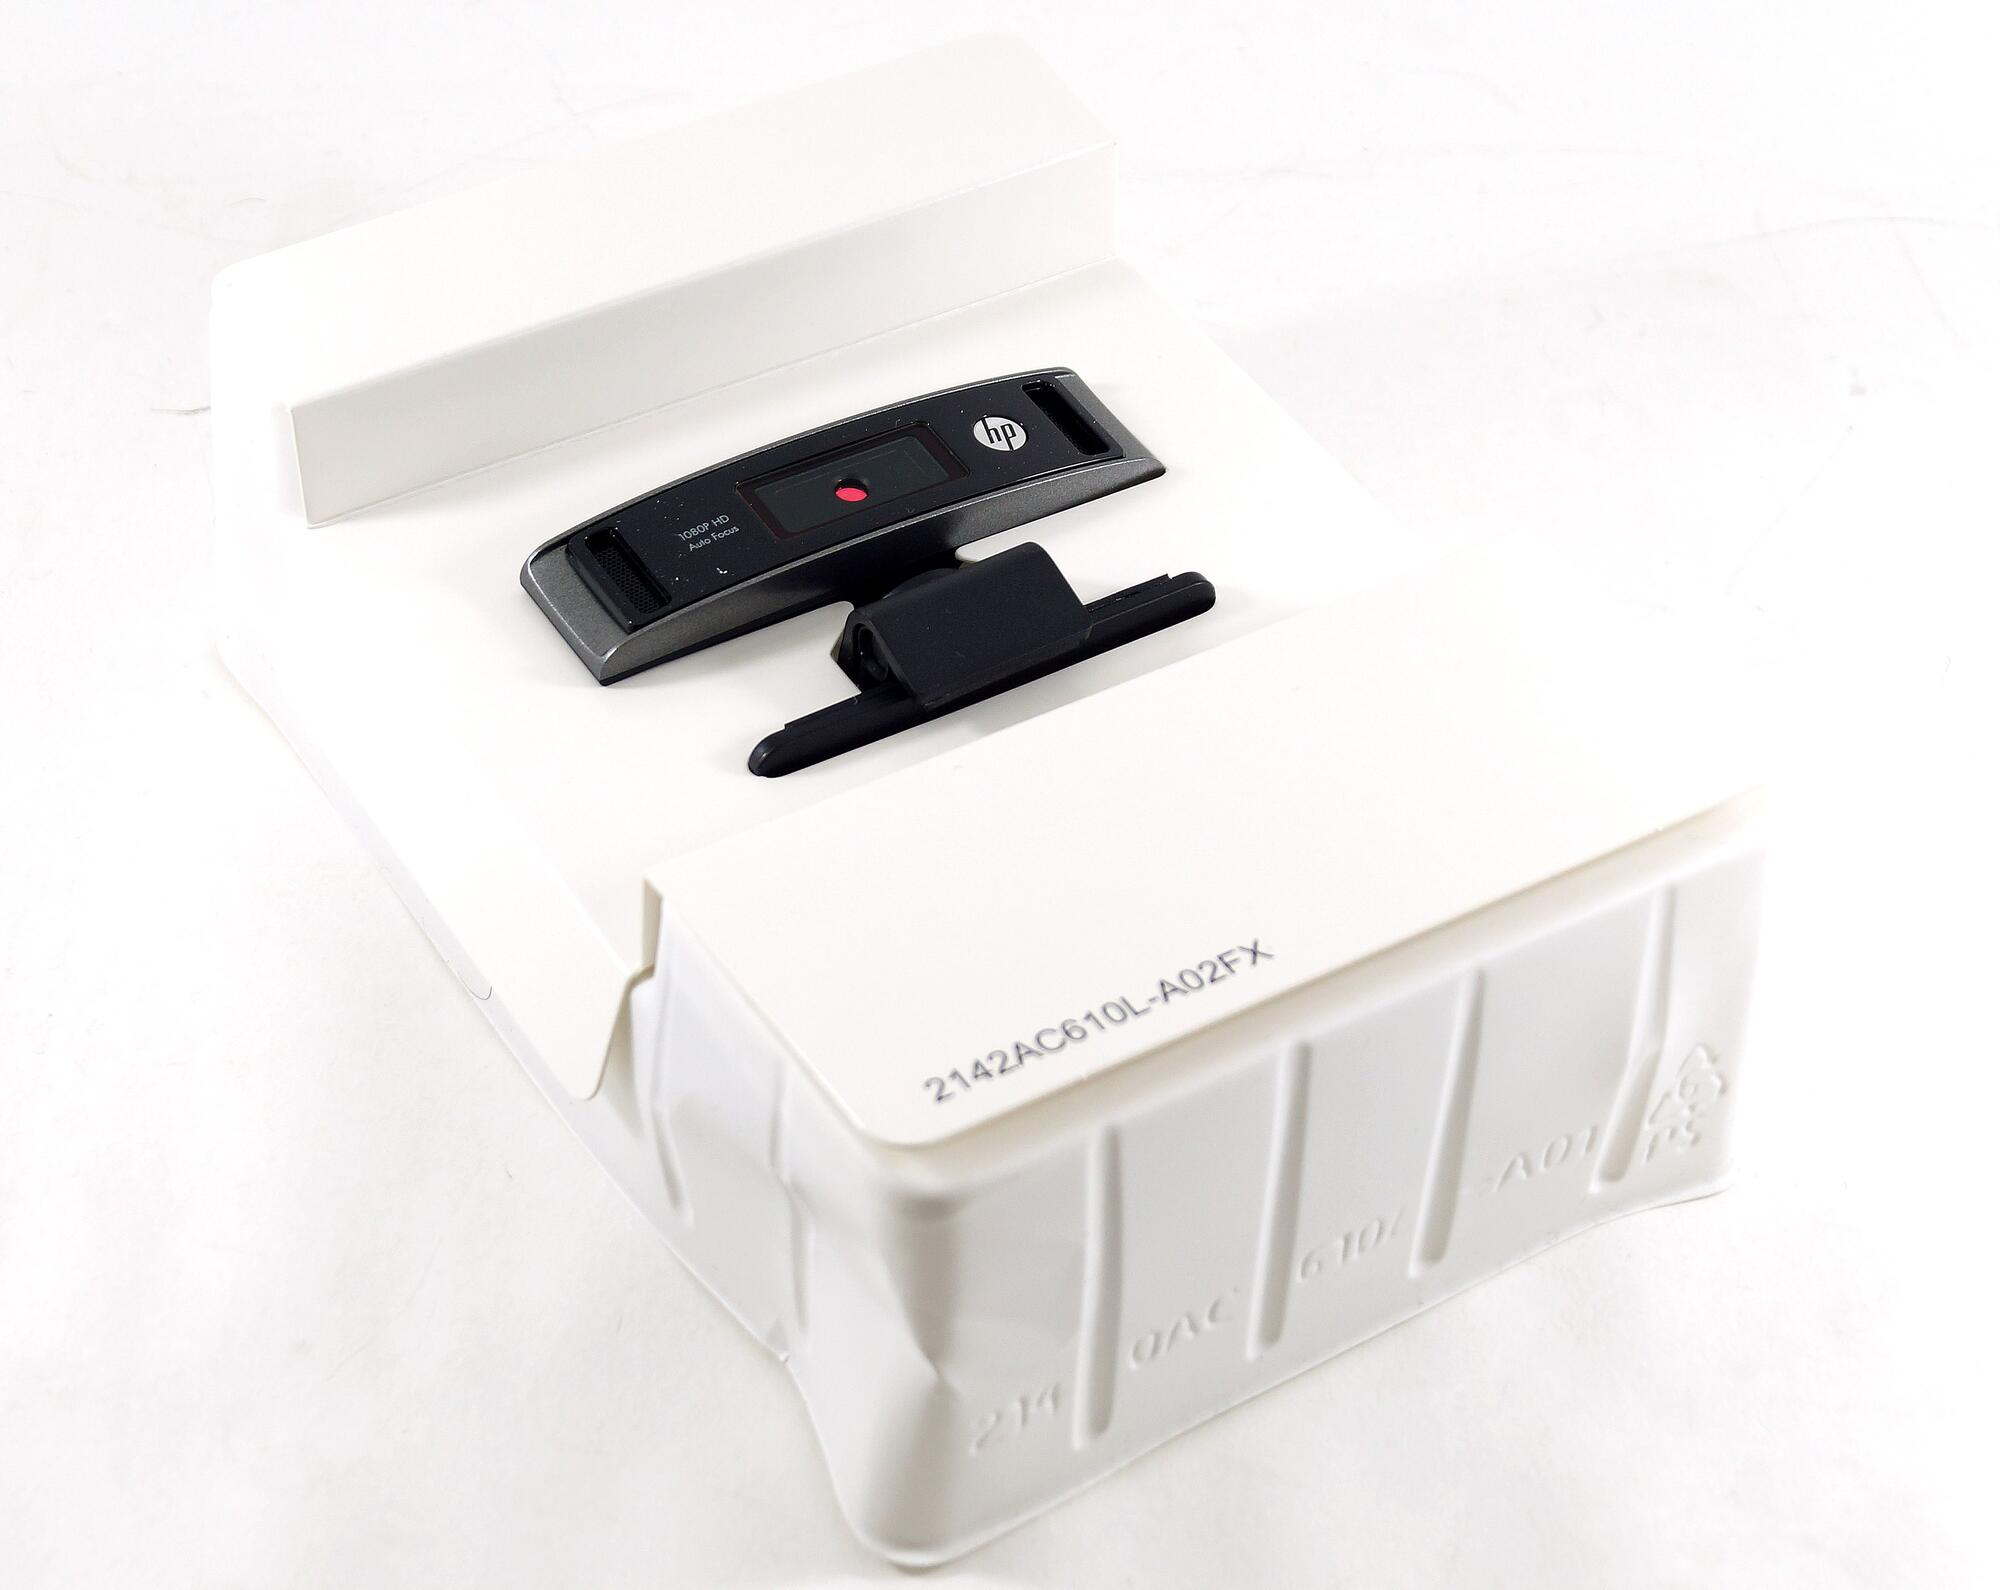 Periferiya - Obzor veb-kamery HP HD 4310